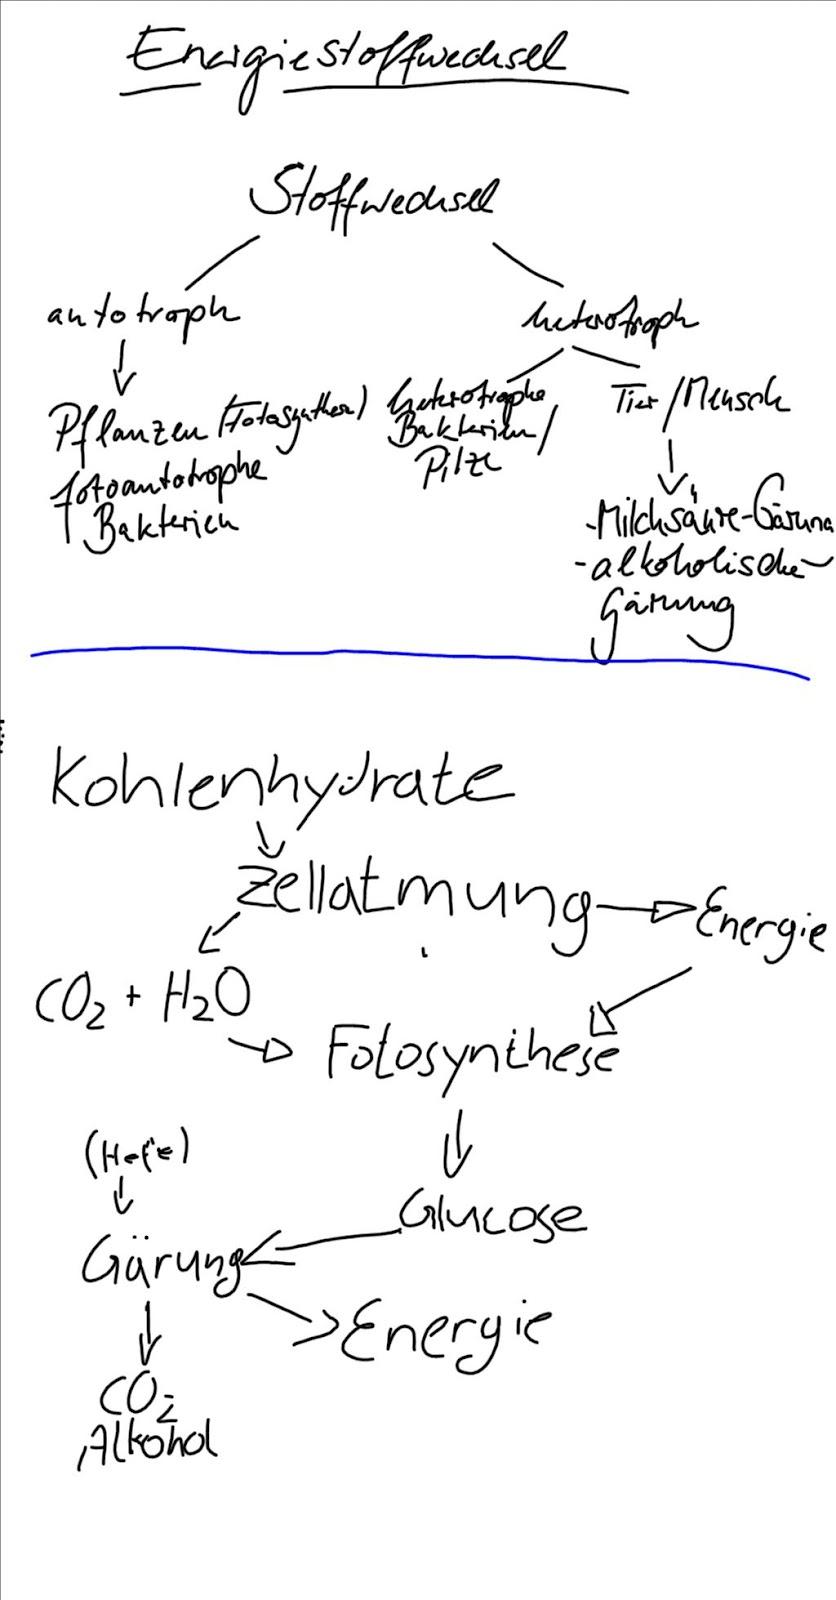 Bio-Blog: Energiestoffwechsel & ATP